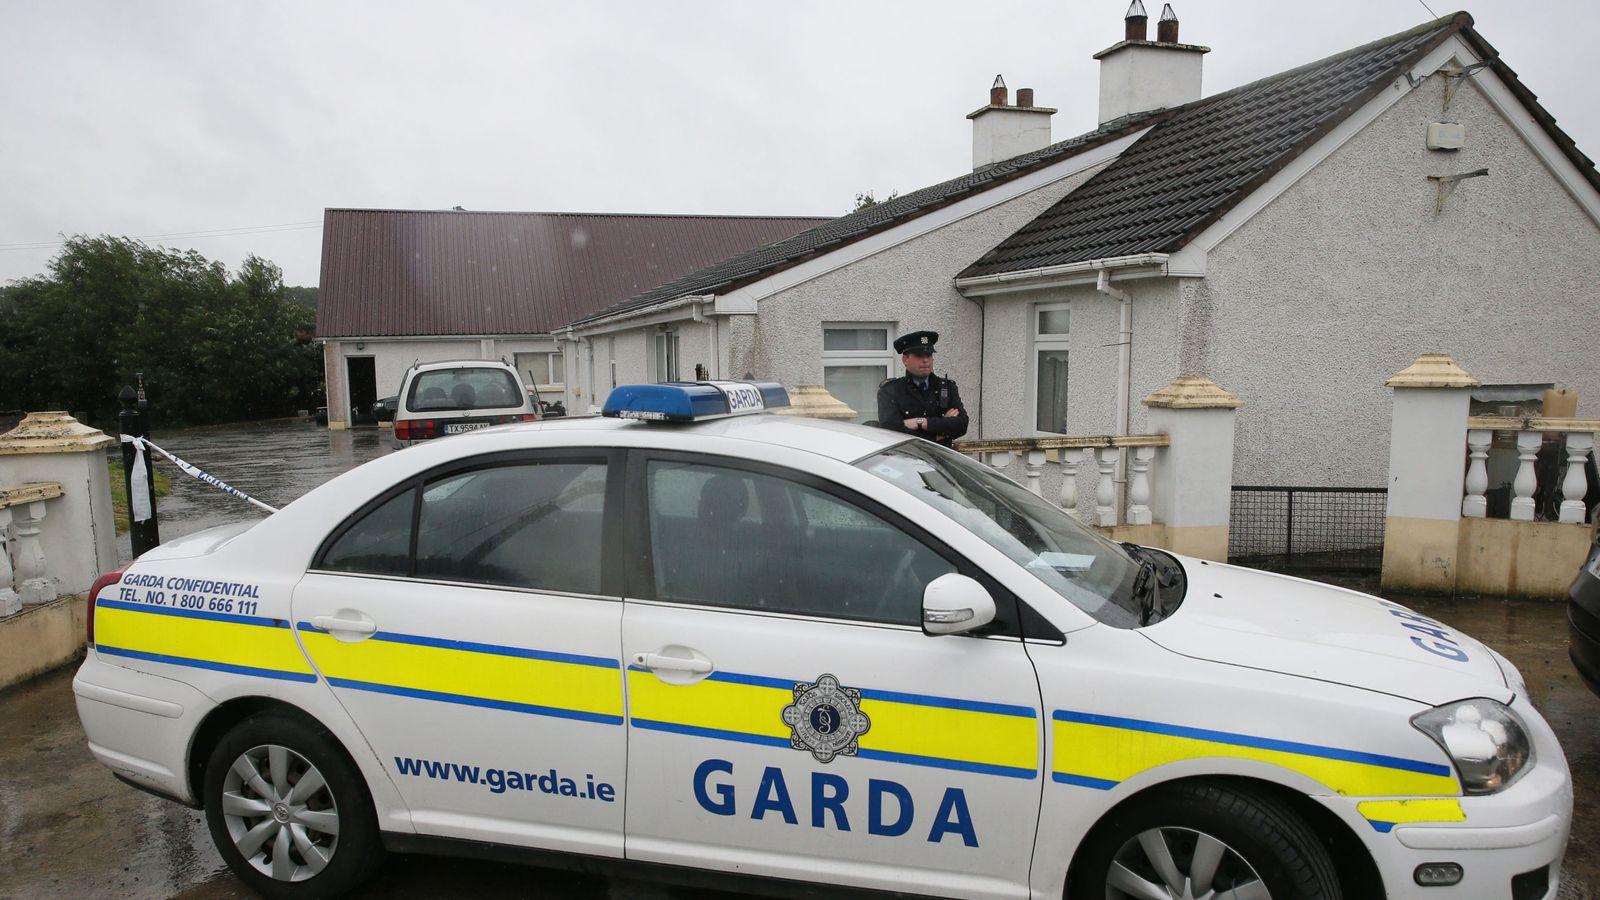 Man shot dead as Dublin gang violence continues